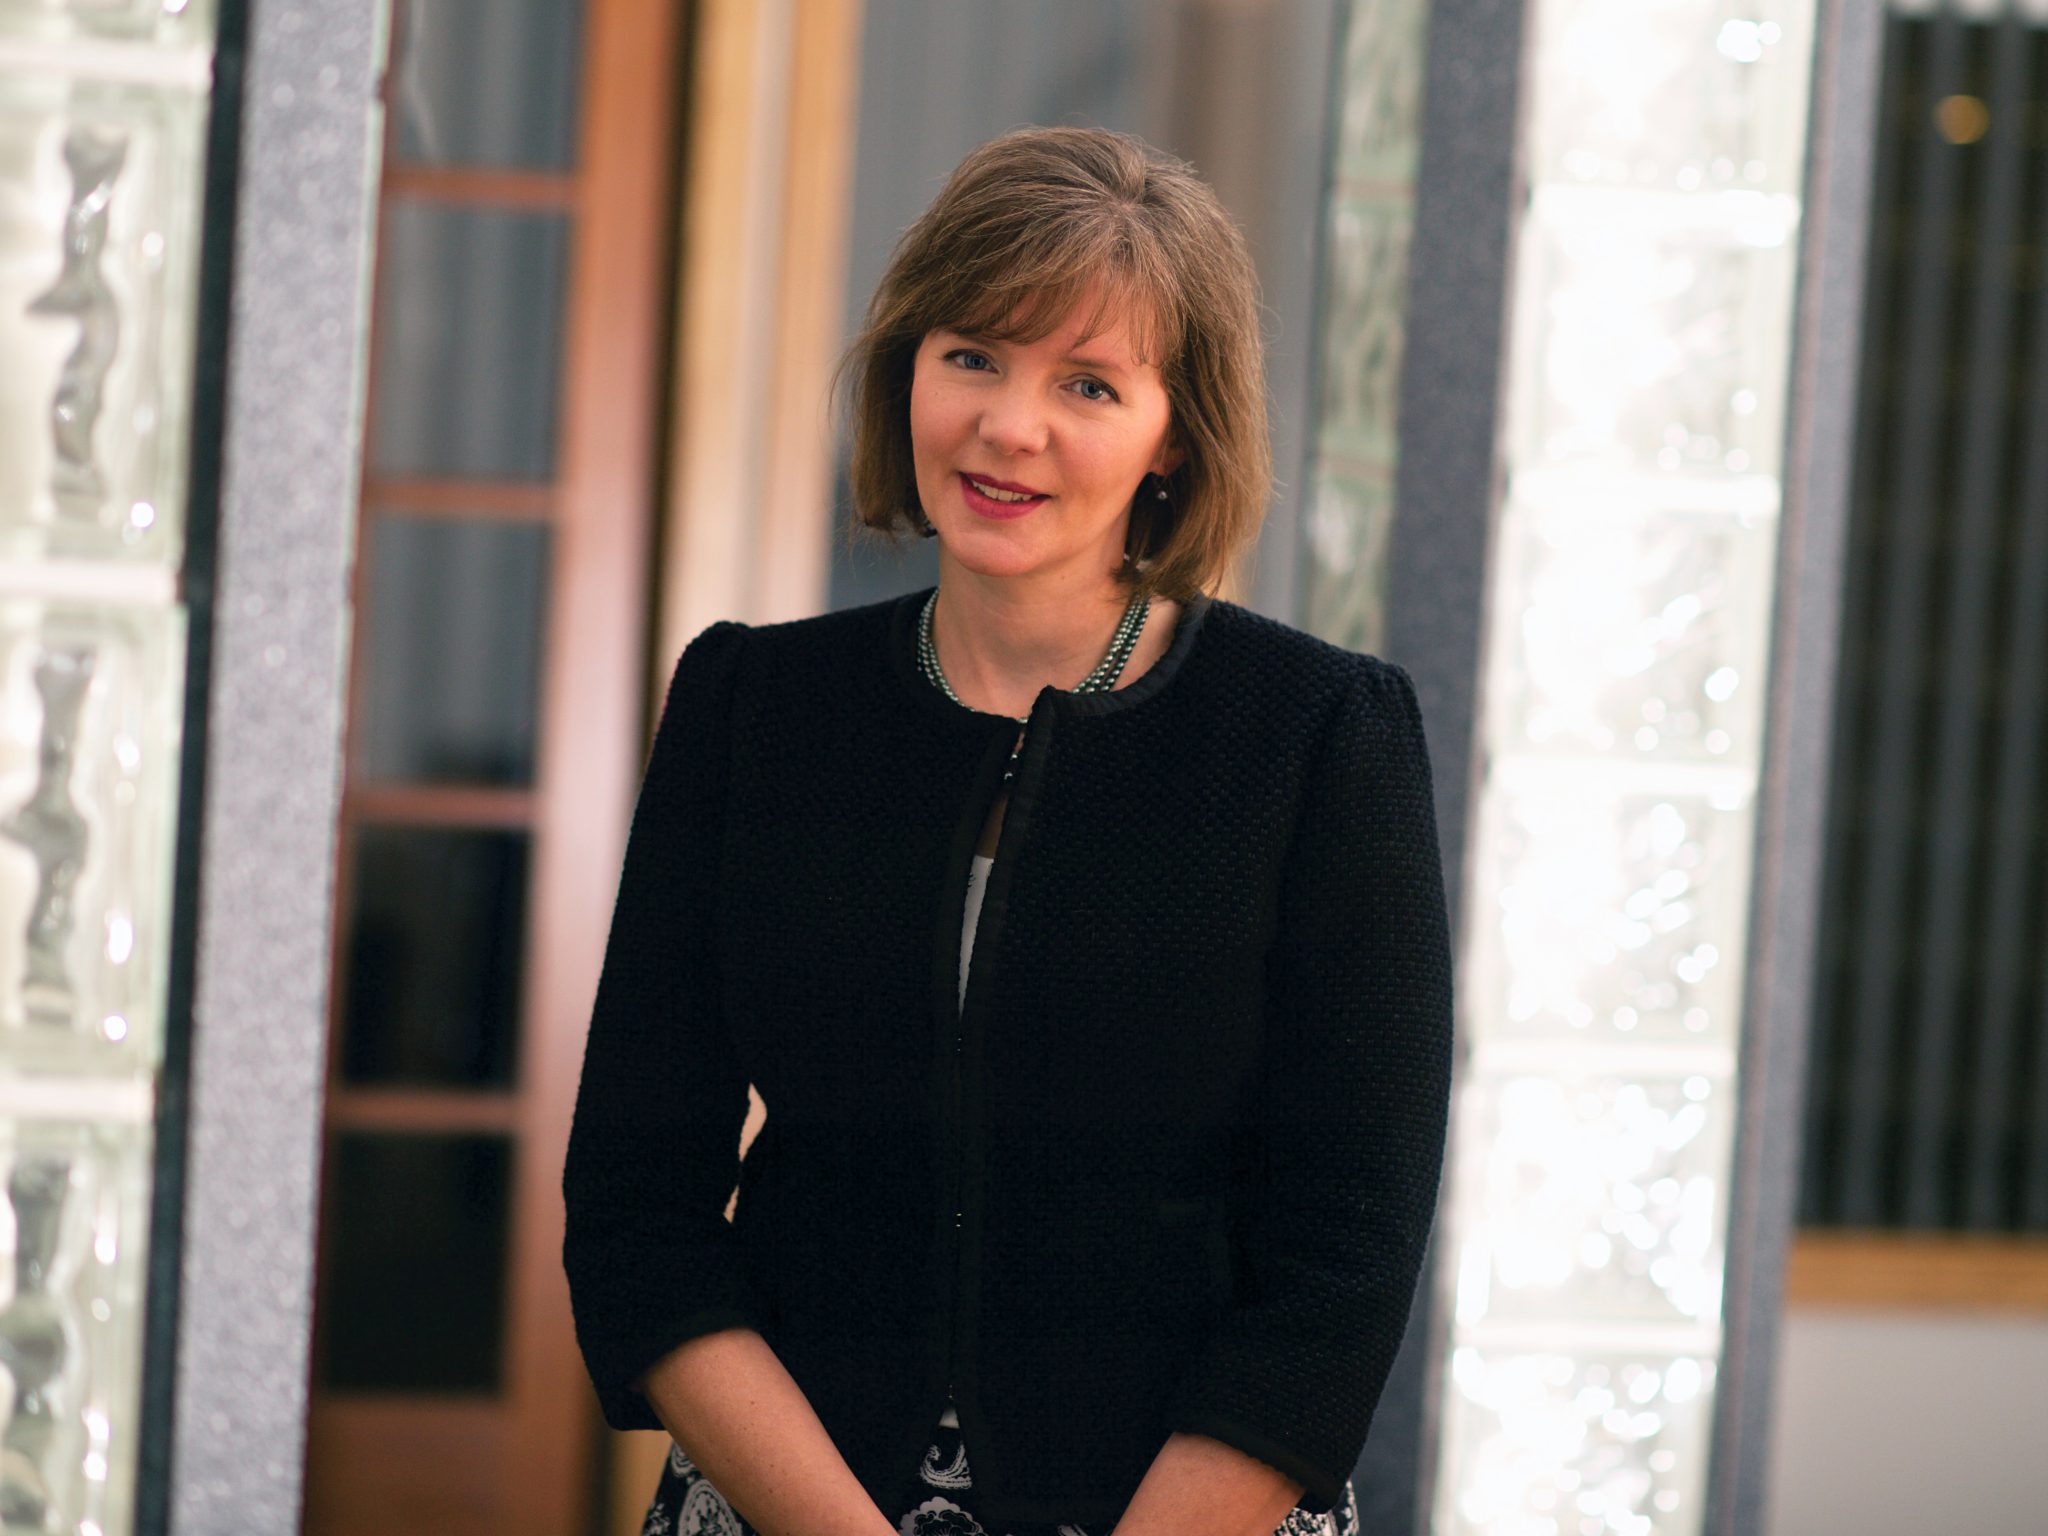 Portrait of Jane Rydholm